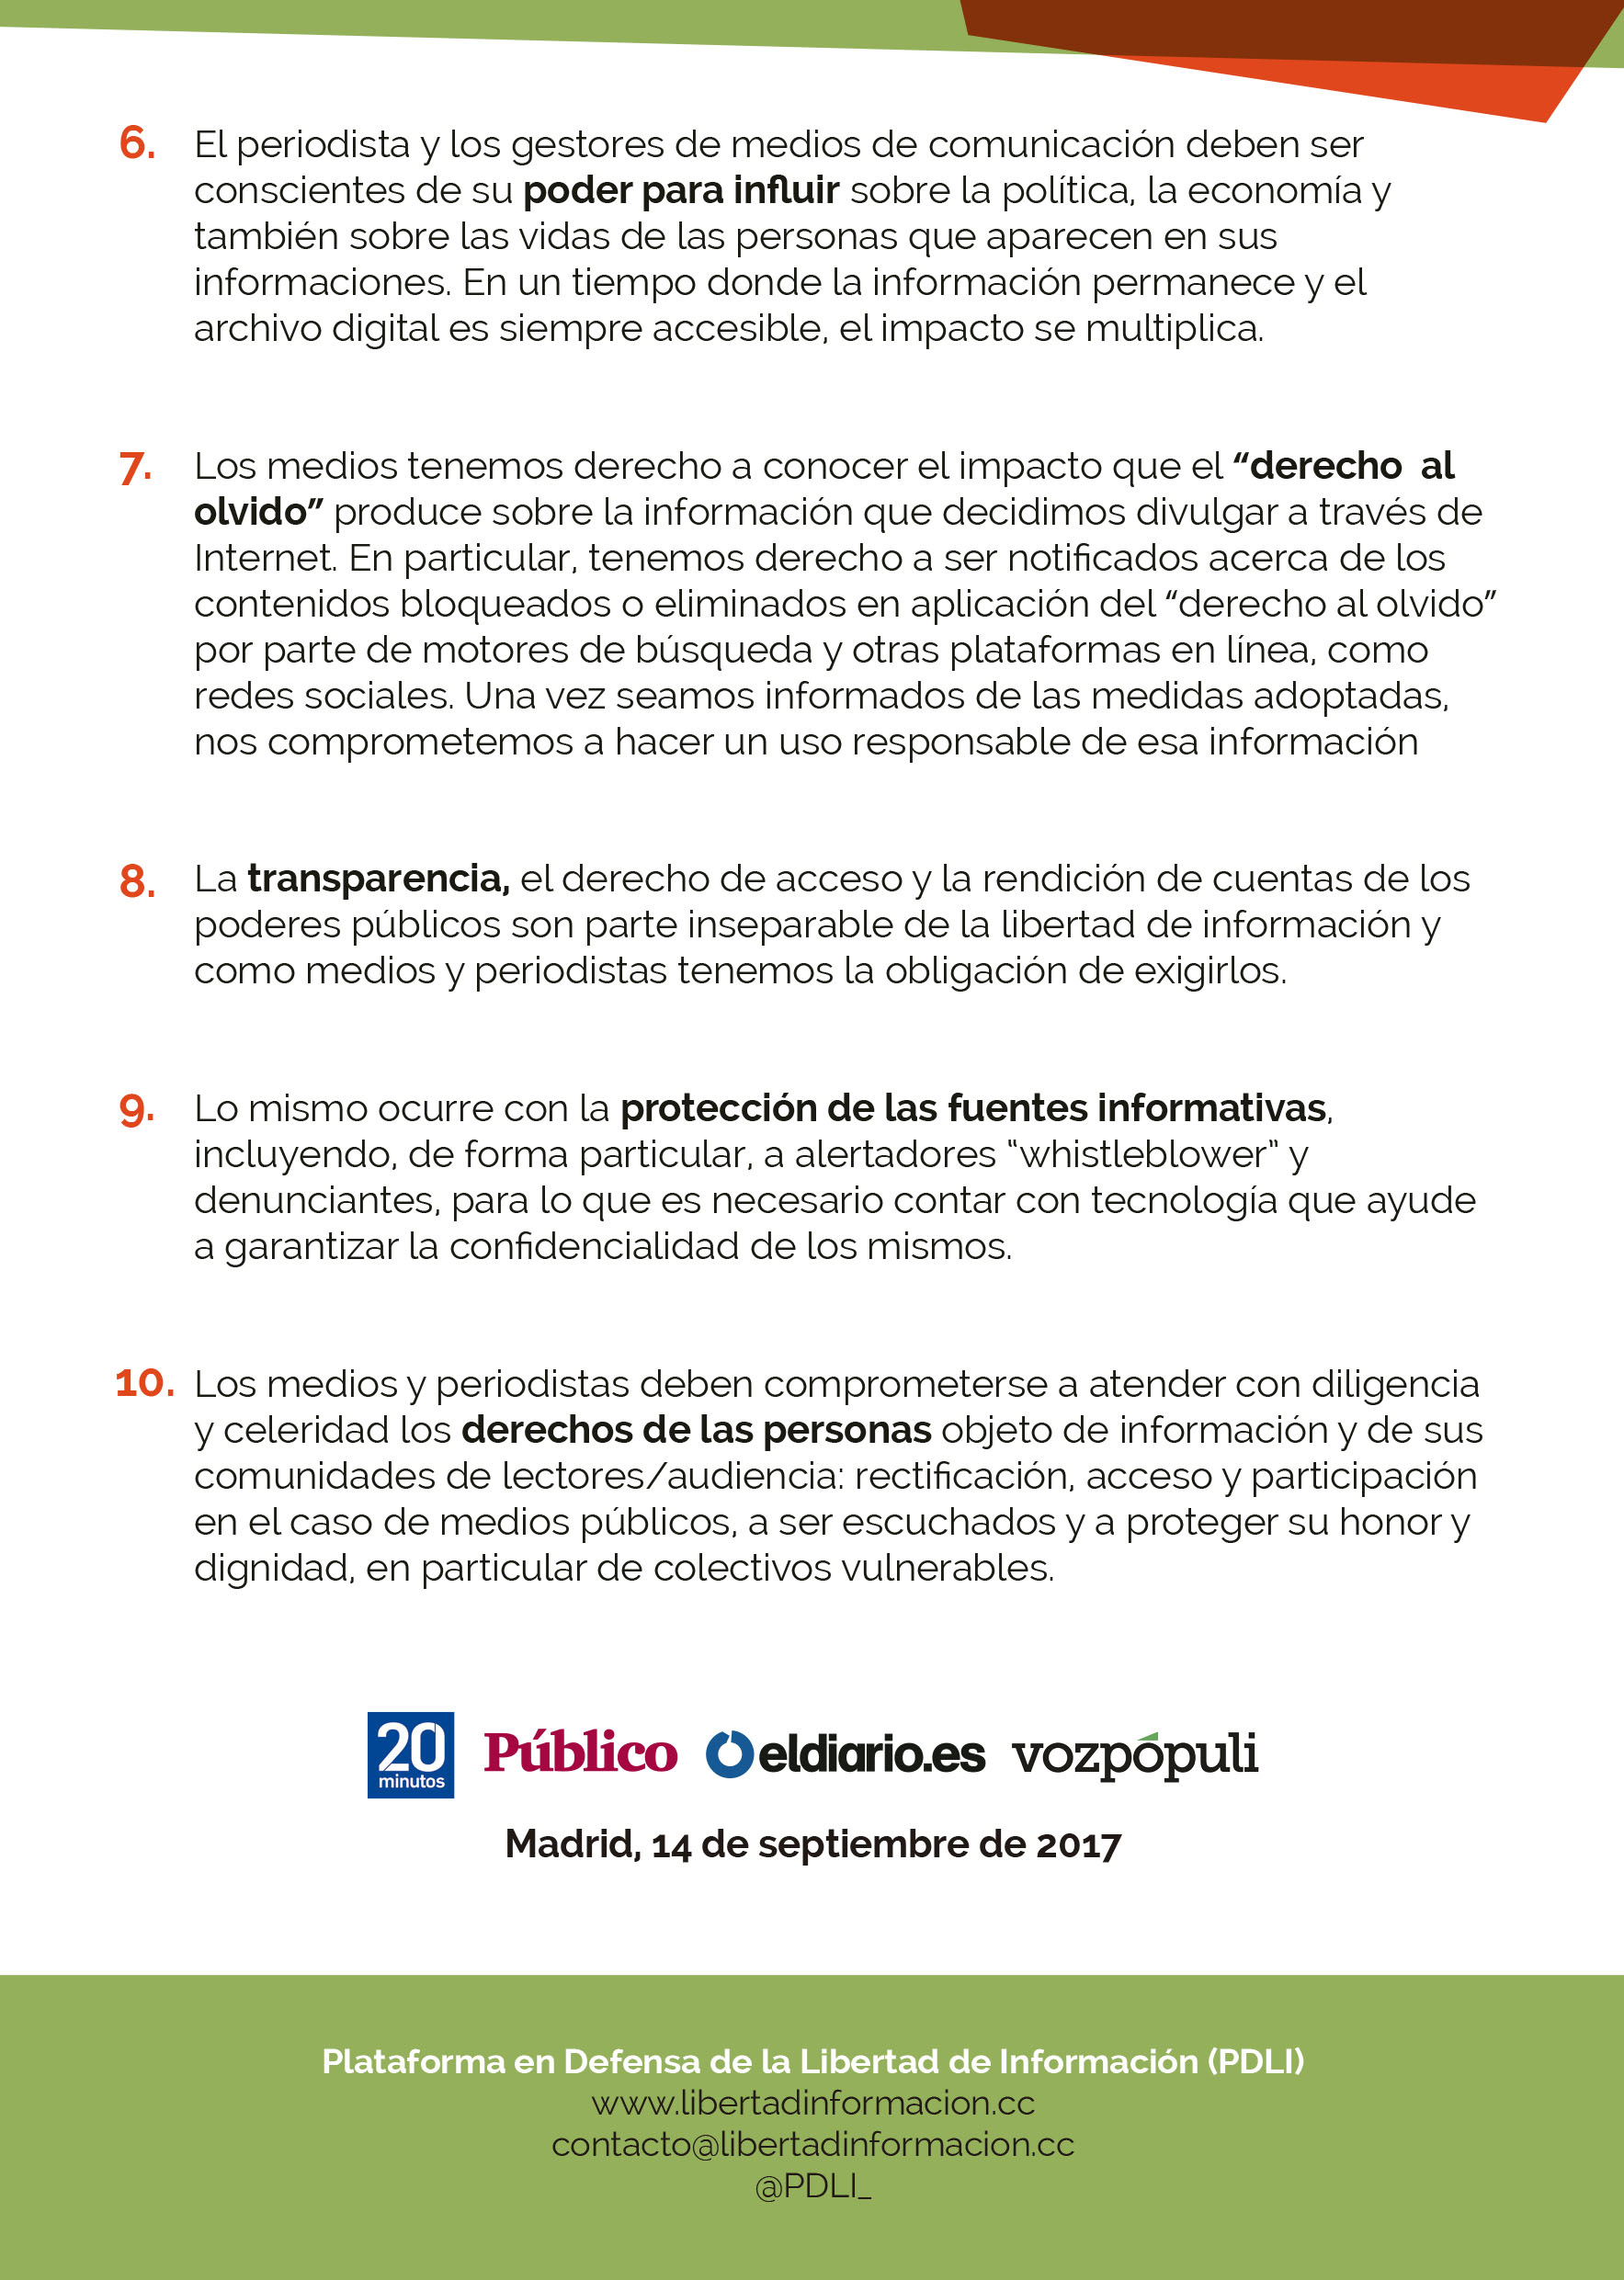 Decálogo Periodismo Responsable 2